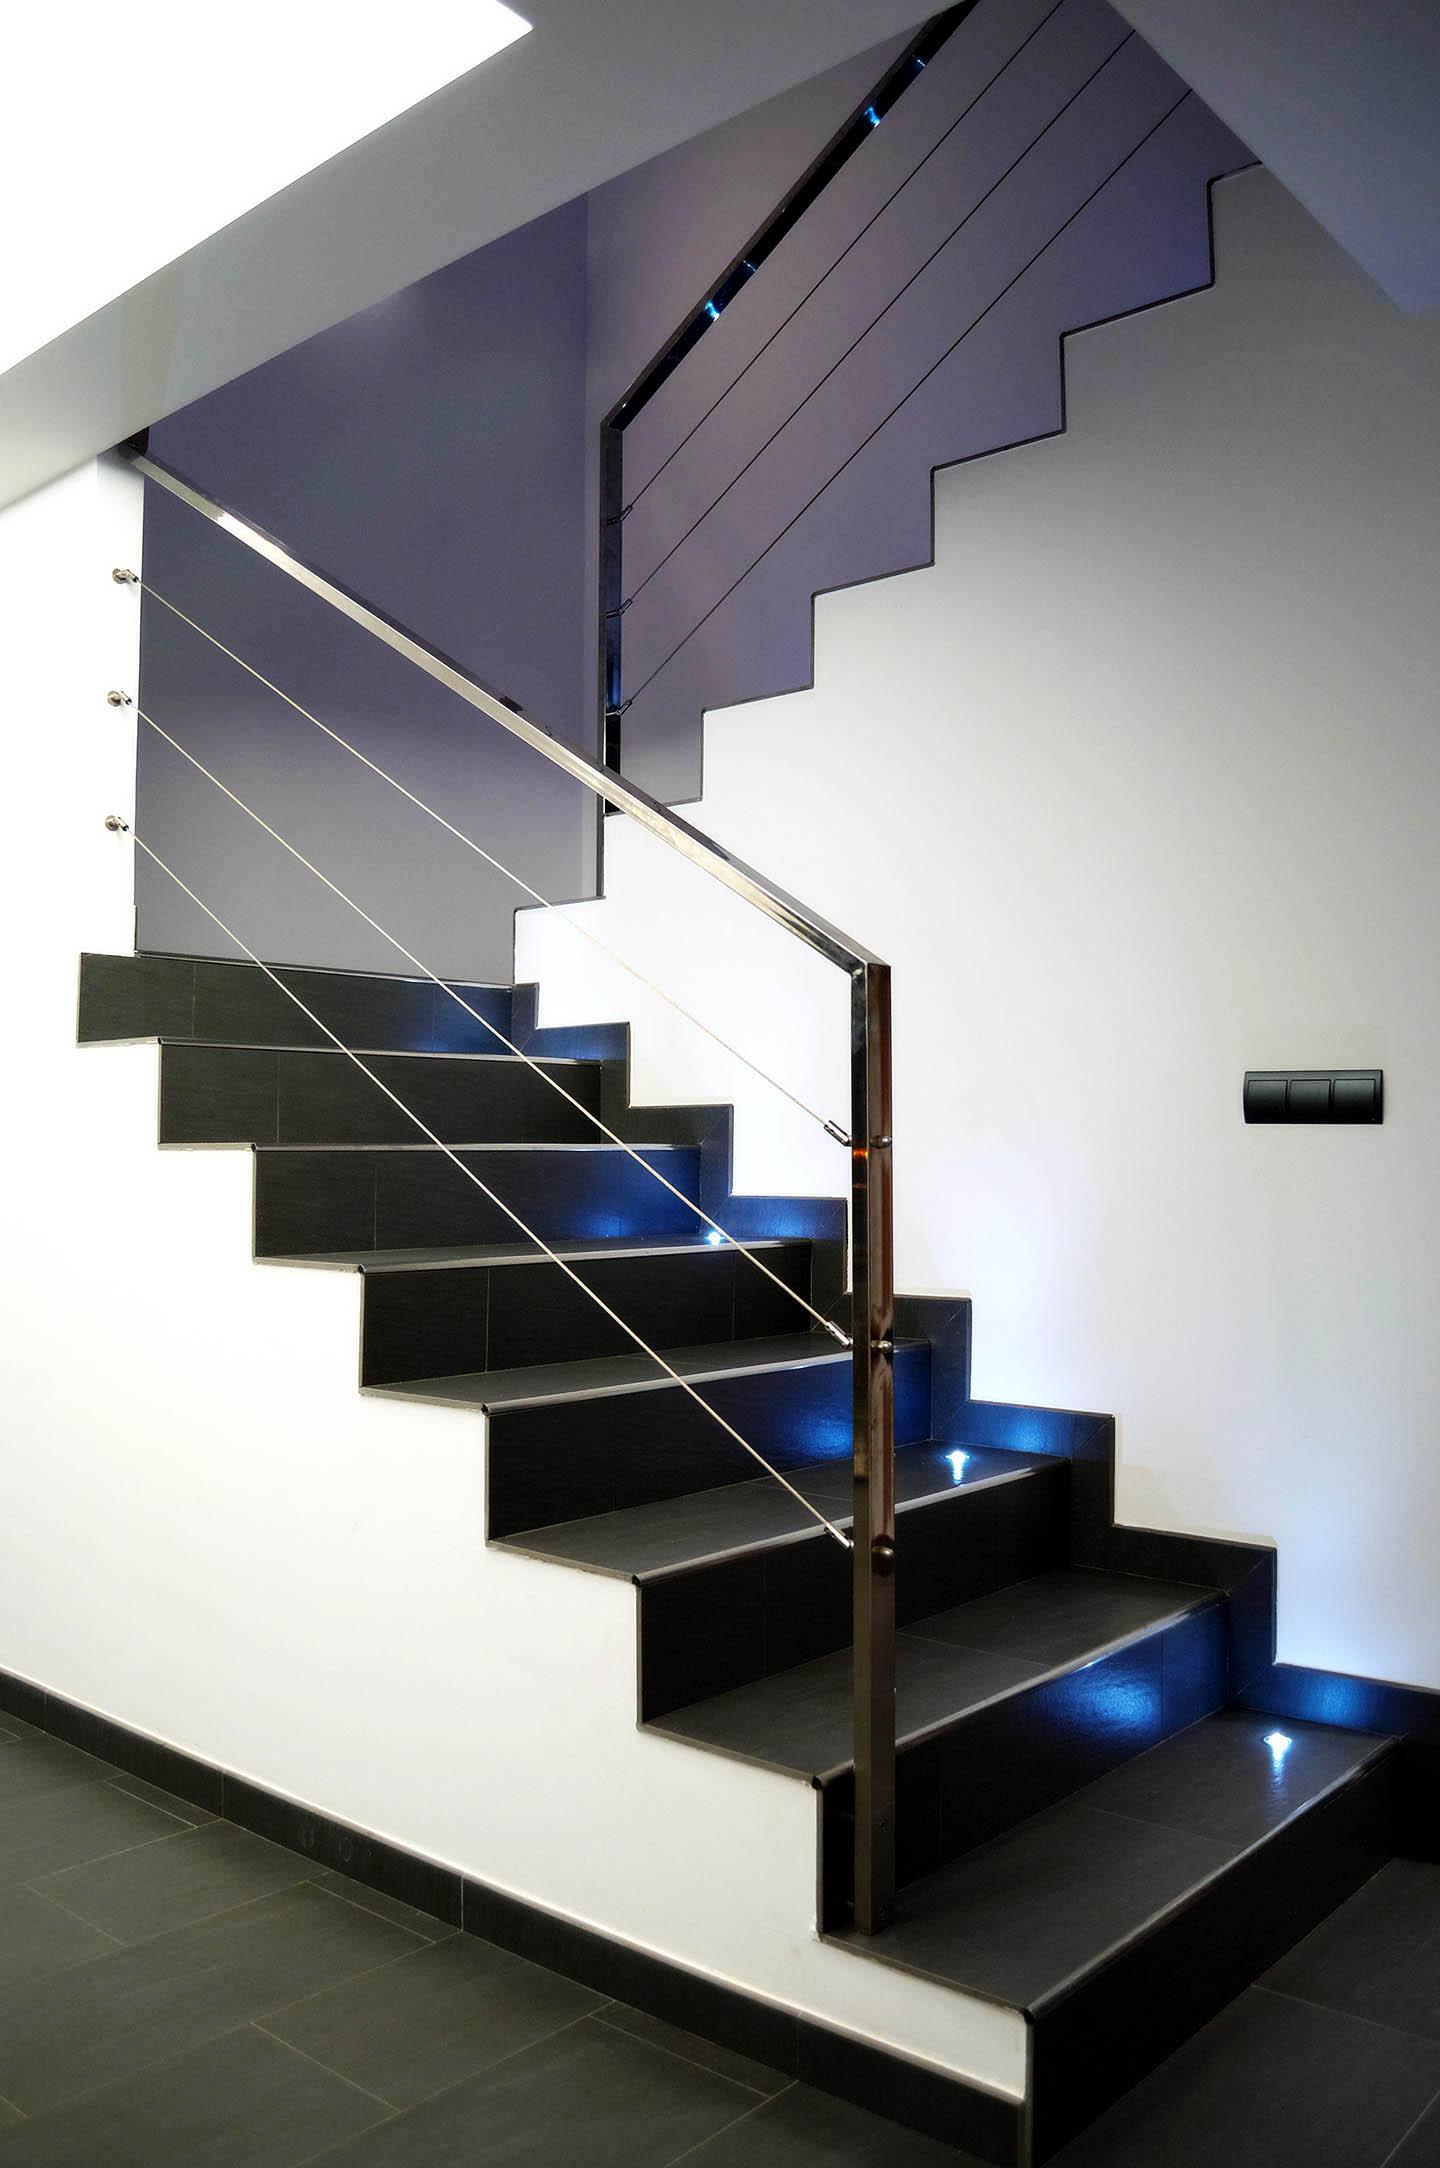 Escaleras intra arquitectos - Disenos de escaleras para casas ...